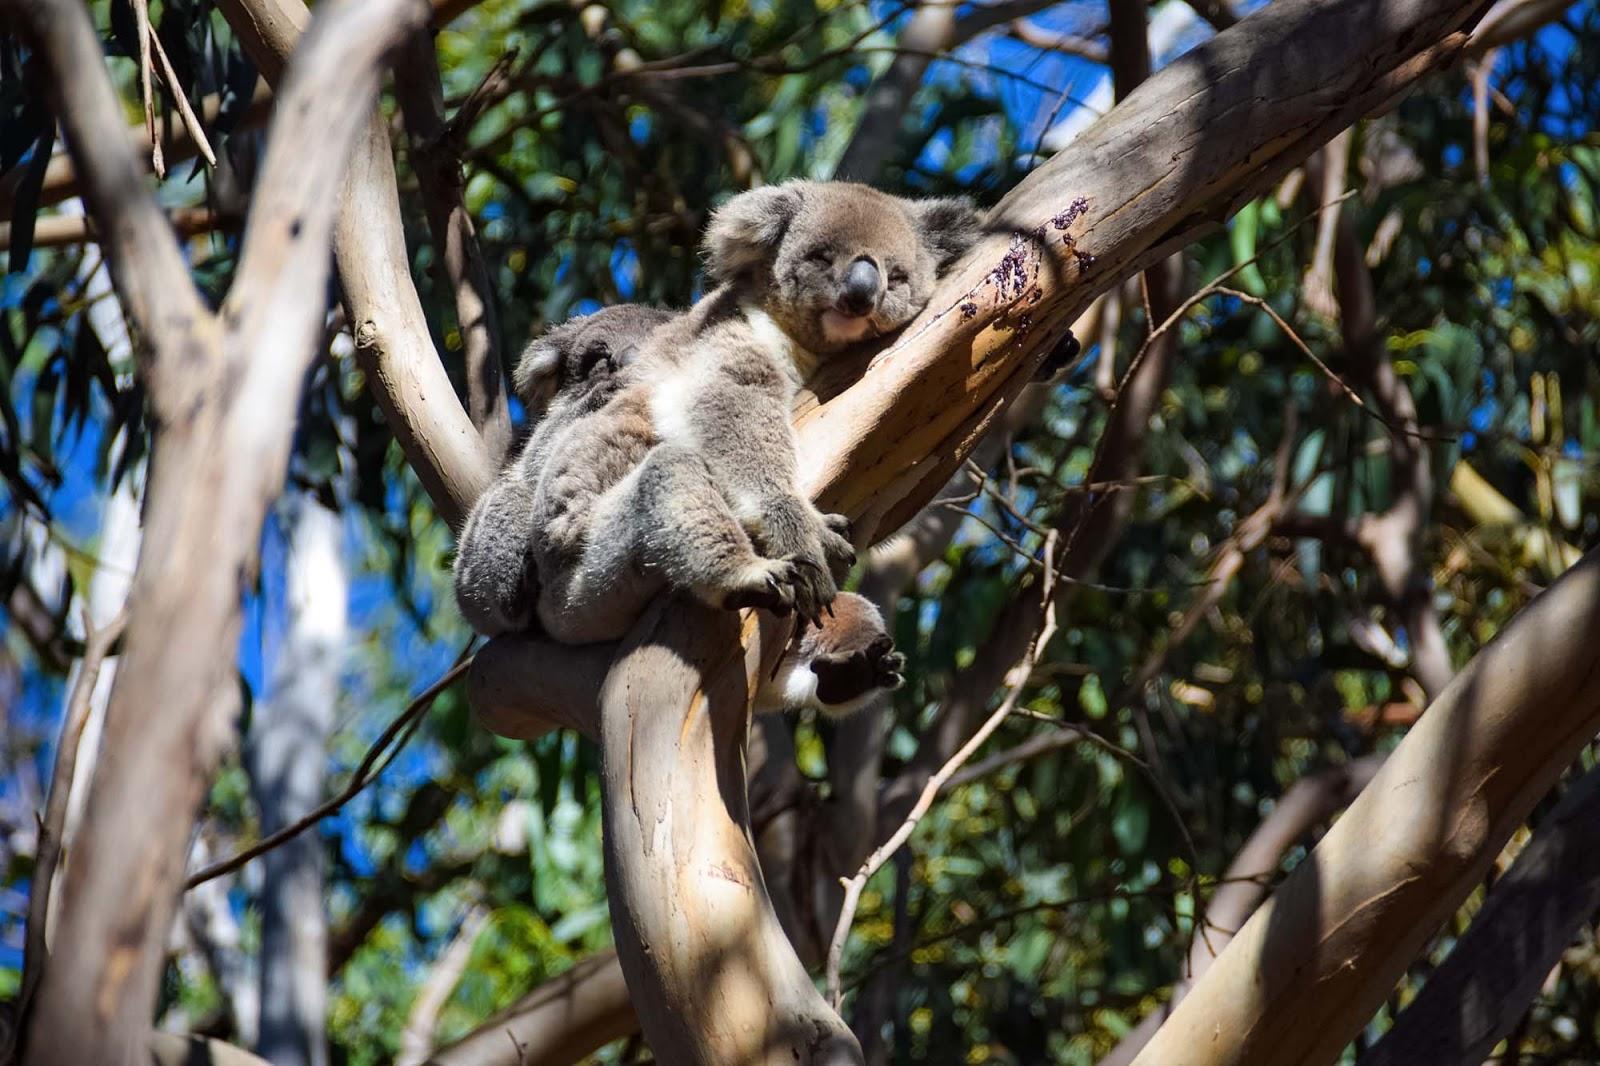 koalas at hanson bay wildlife sanctuary